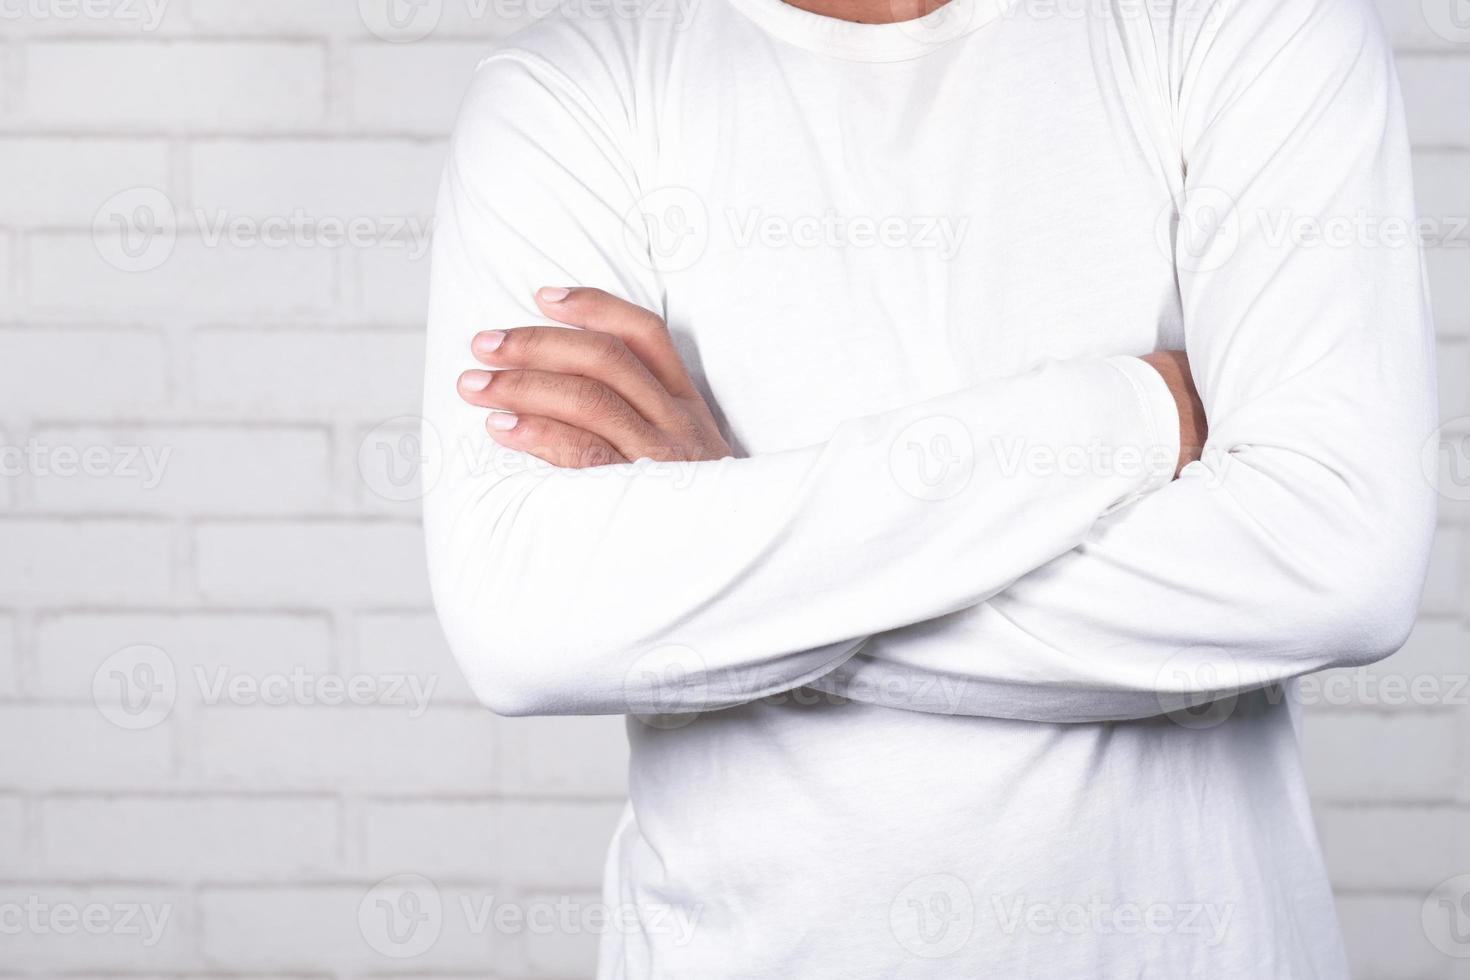 man met armen gekruist op neutrale achtergrond foto